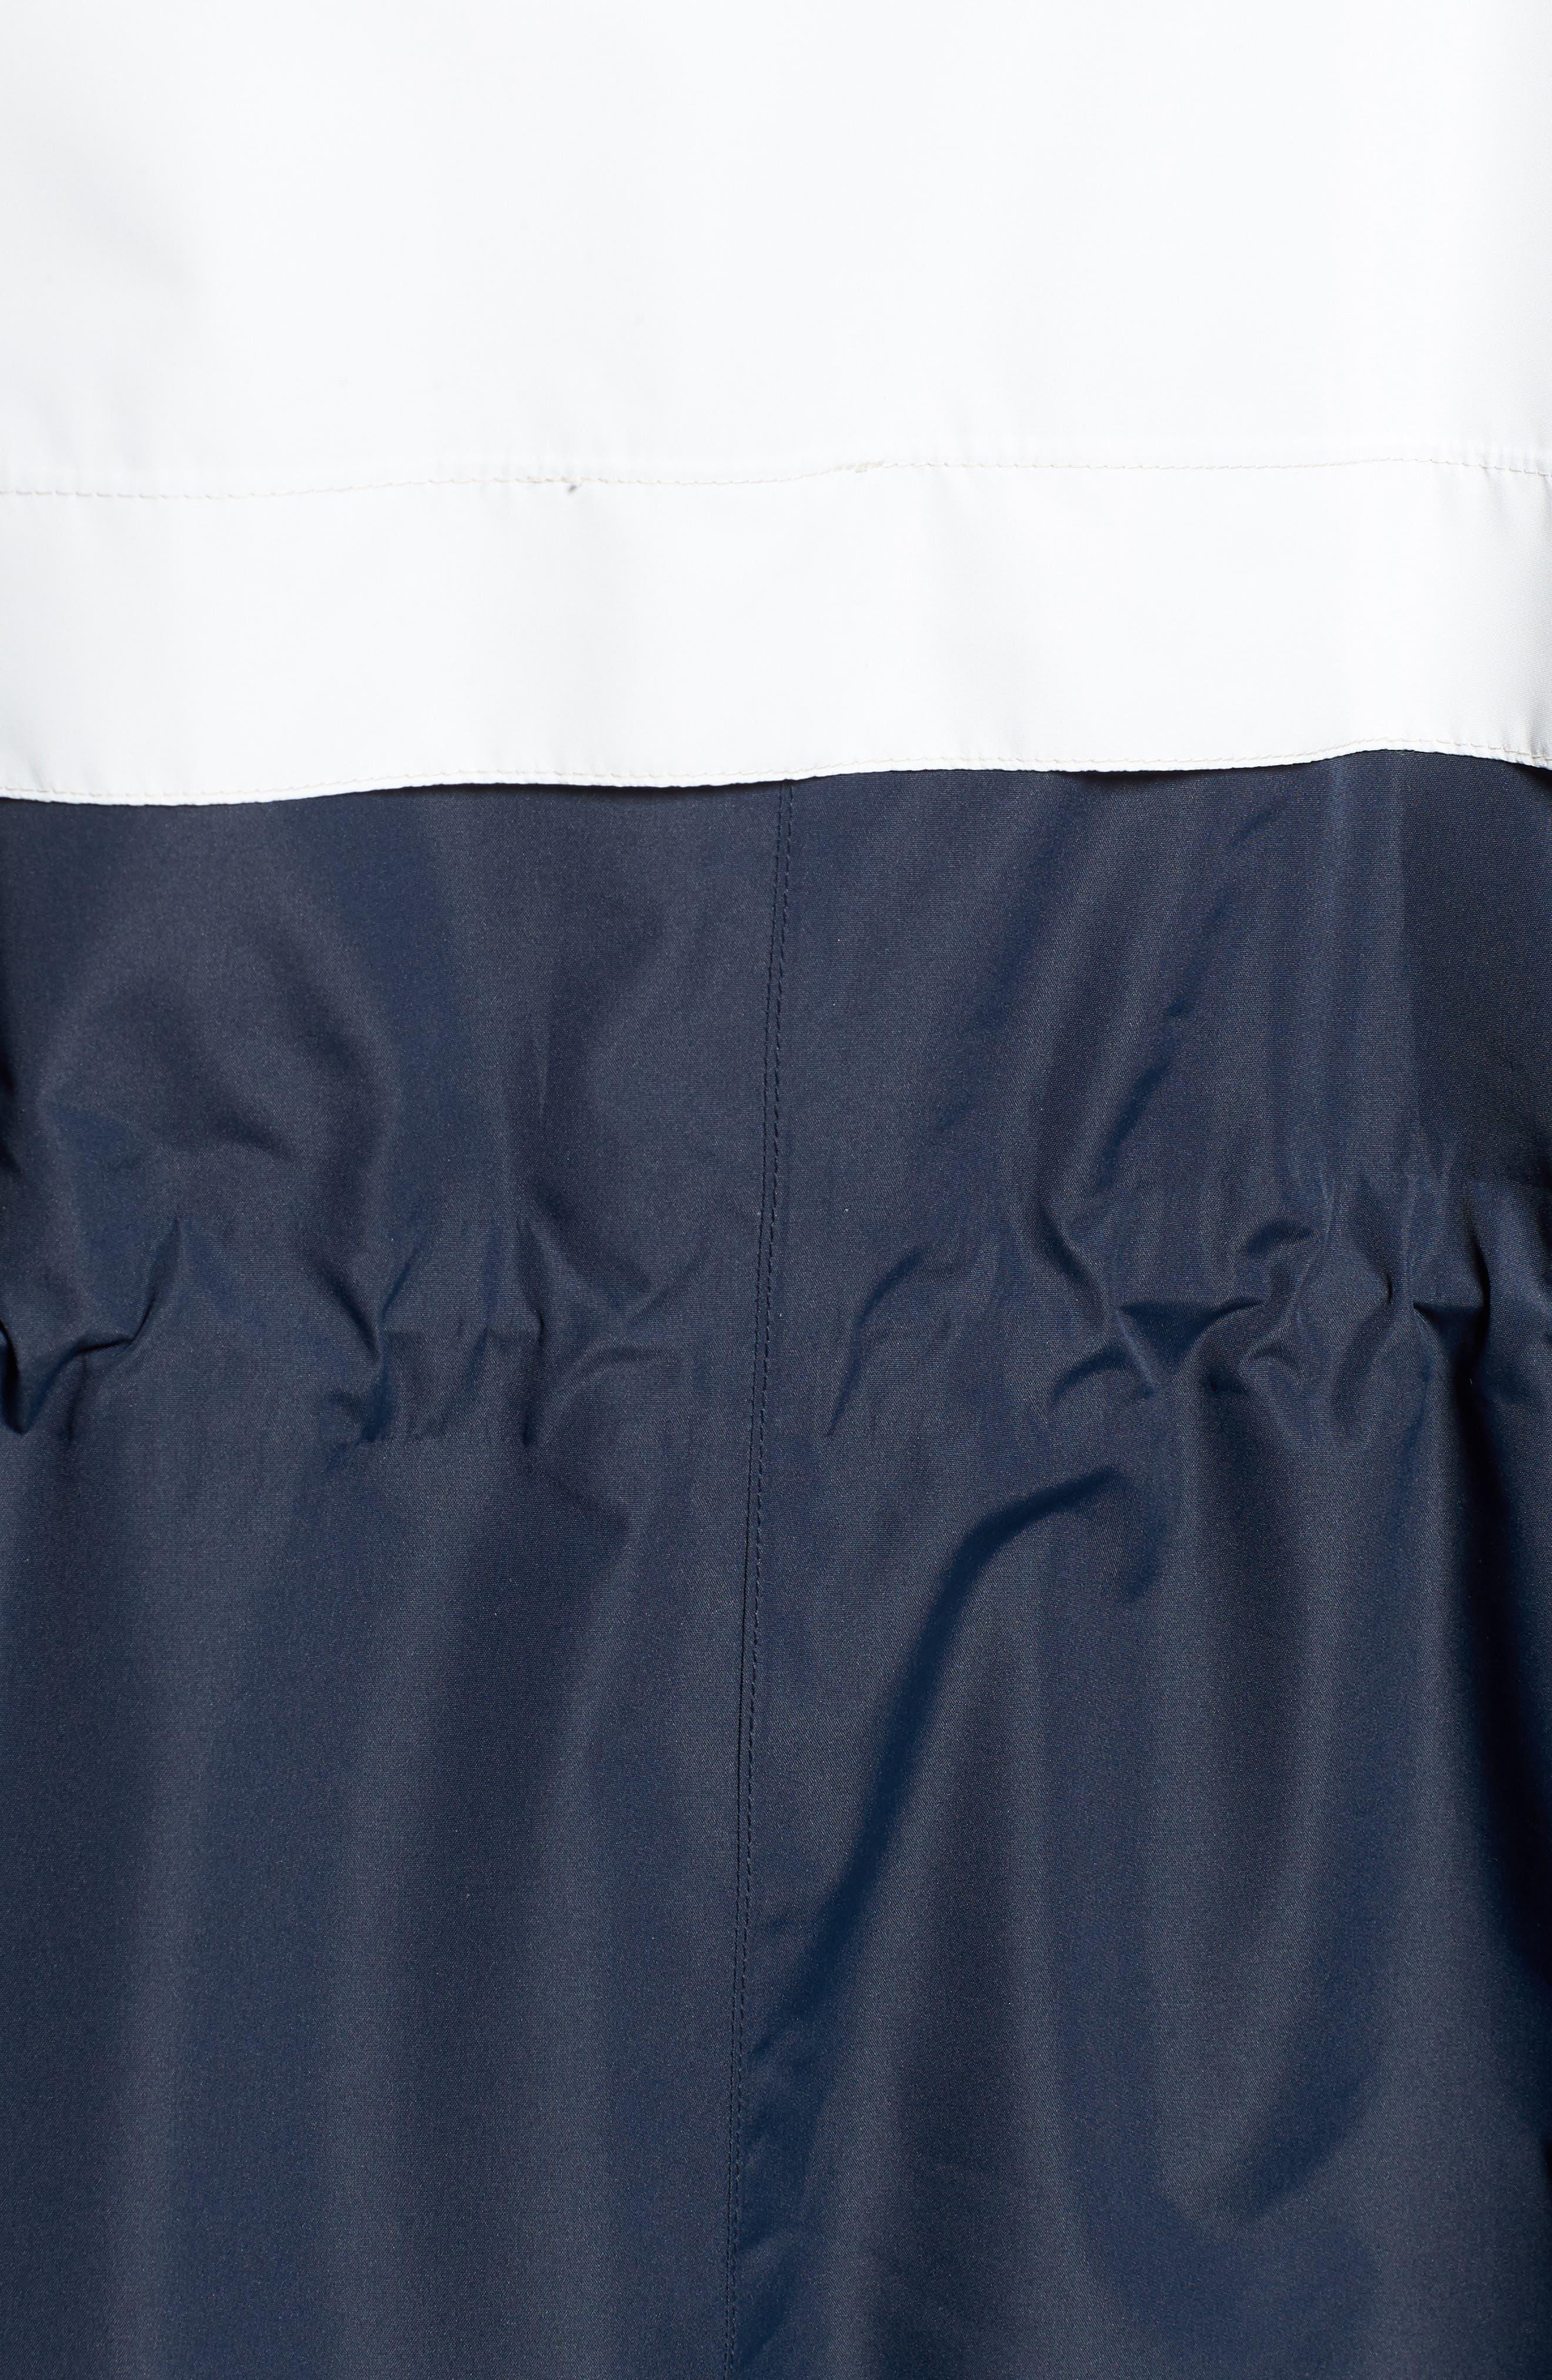 Damini Waterproof Jacket,                             Alternate thumbnail 7, color,                             410